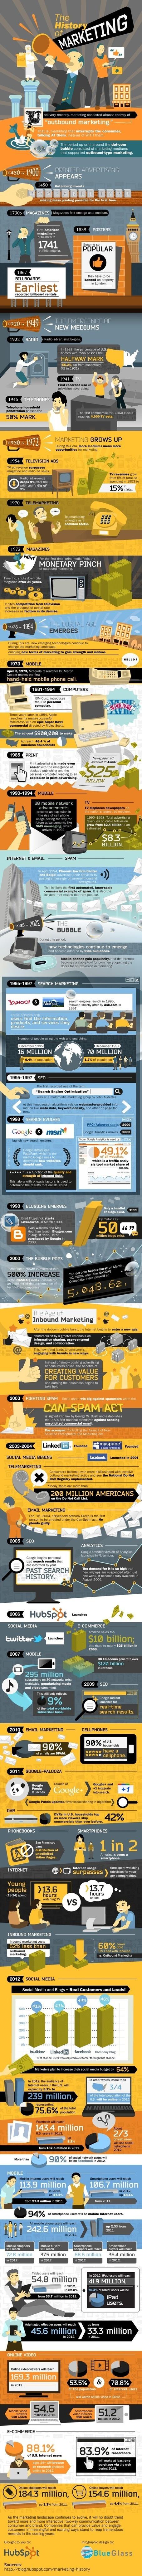 The-History-Of-Marketing